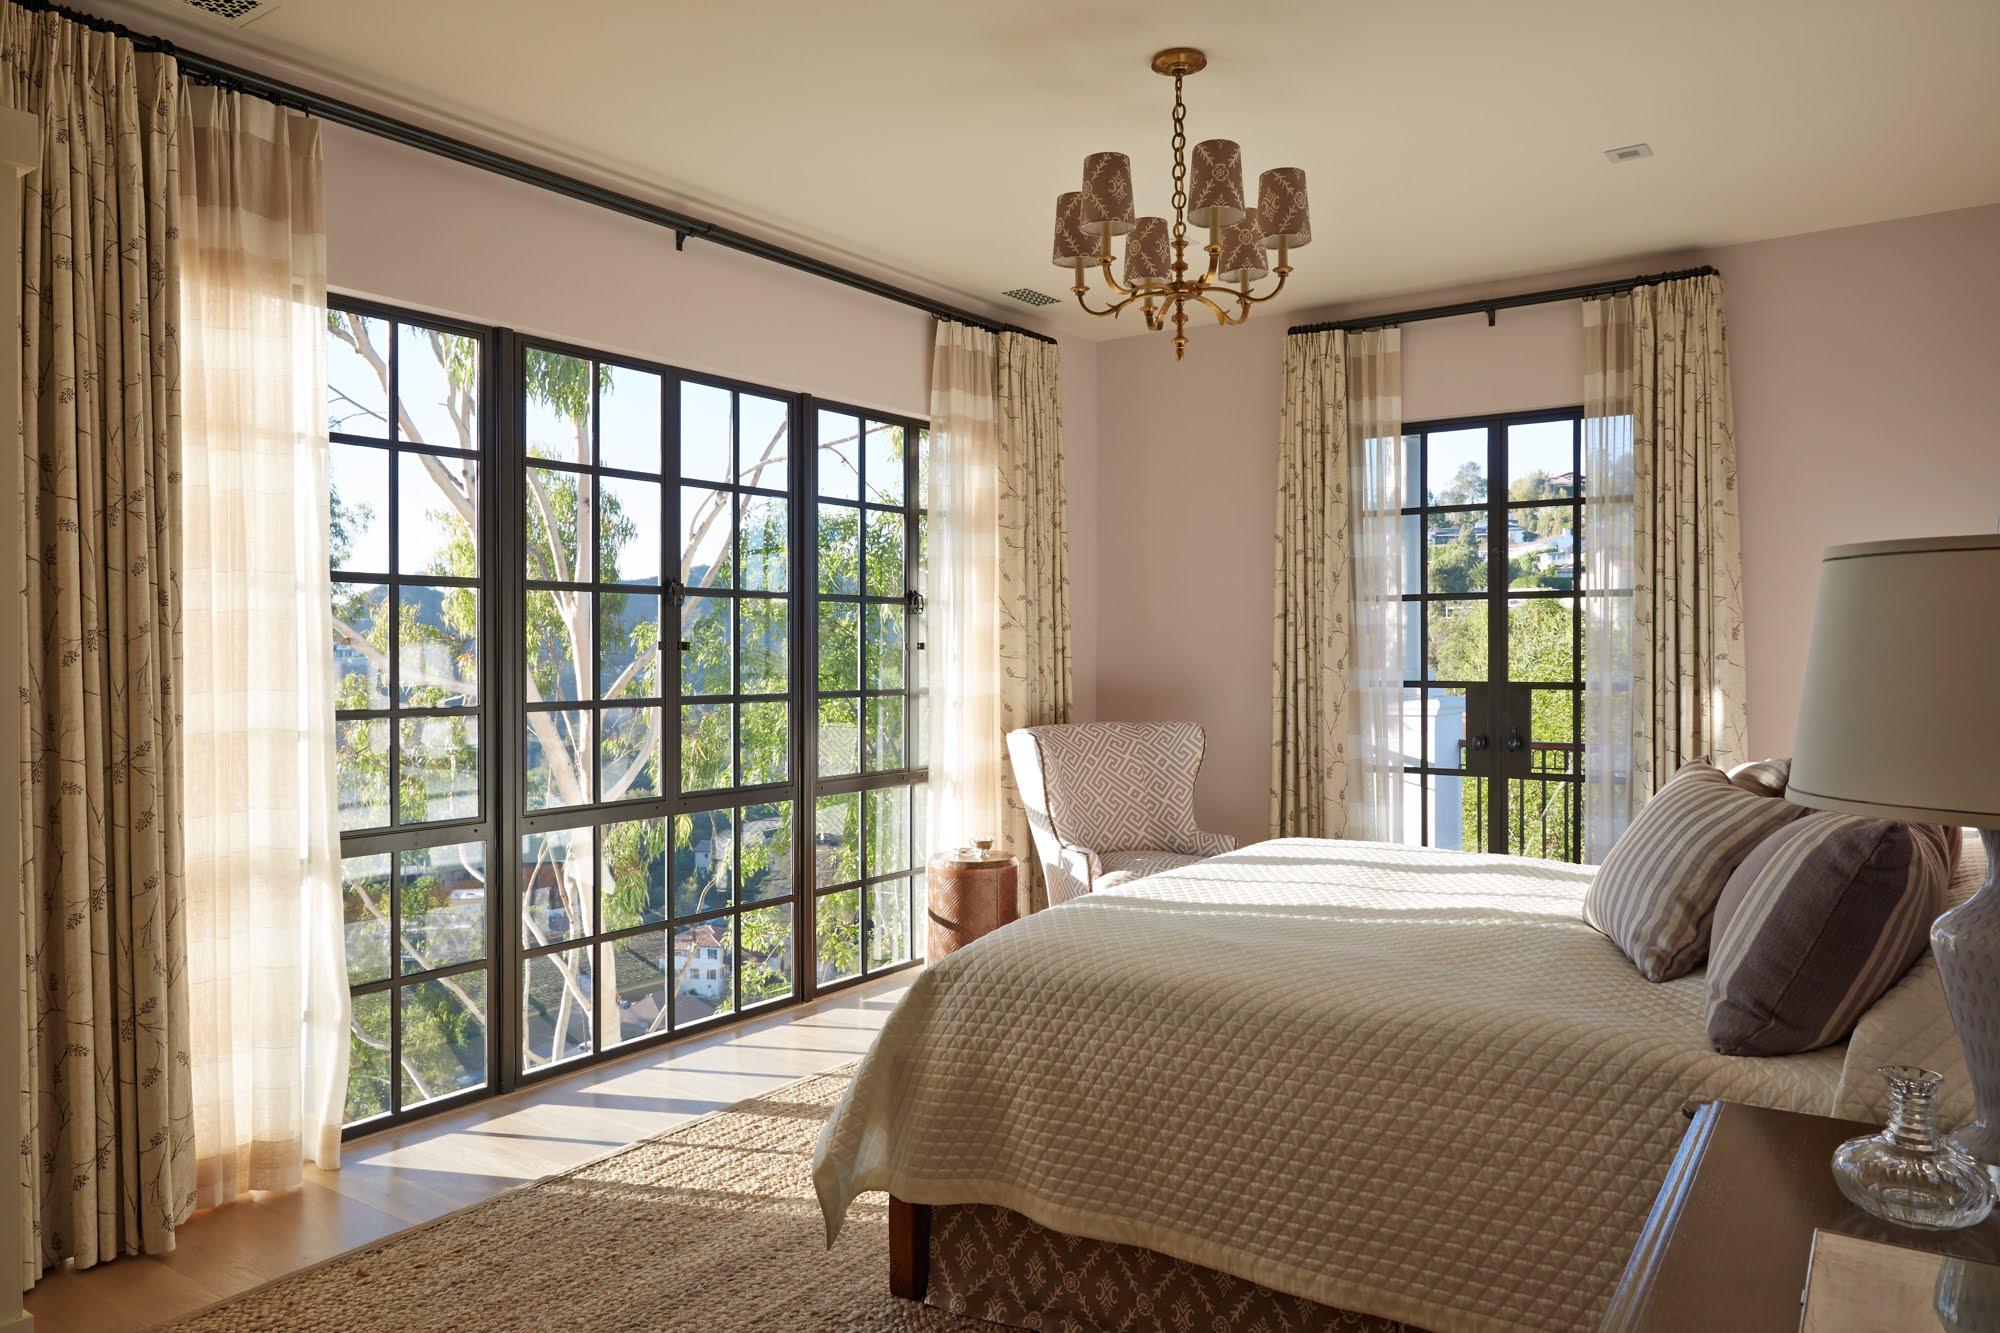 William_Hefner_beverly_crest_projects_Barnett__ bedroom_BR__10__Guest